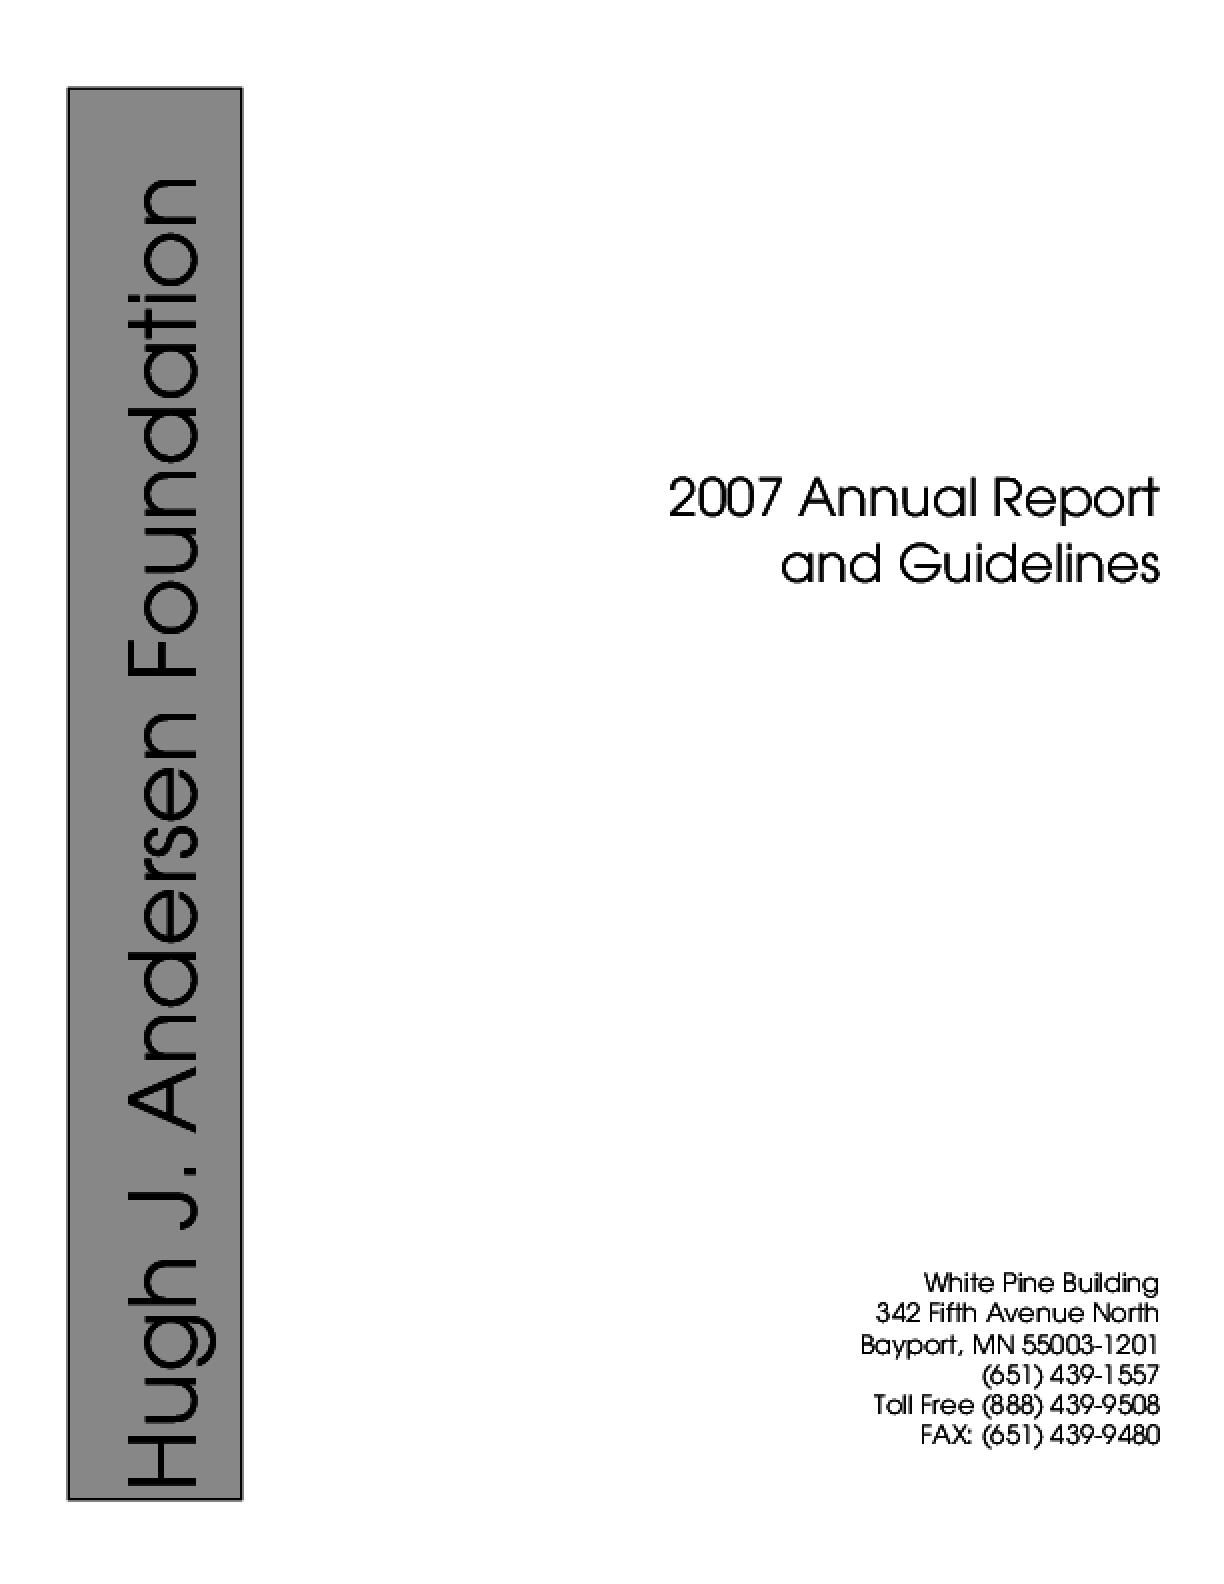 Hugh J. Andersen Foundation - 2007 Annual Report